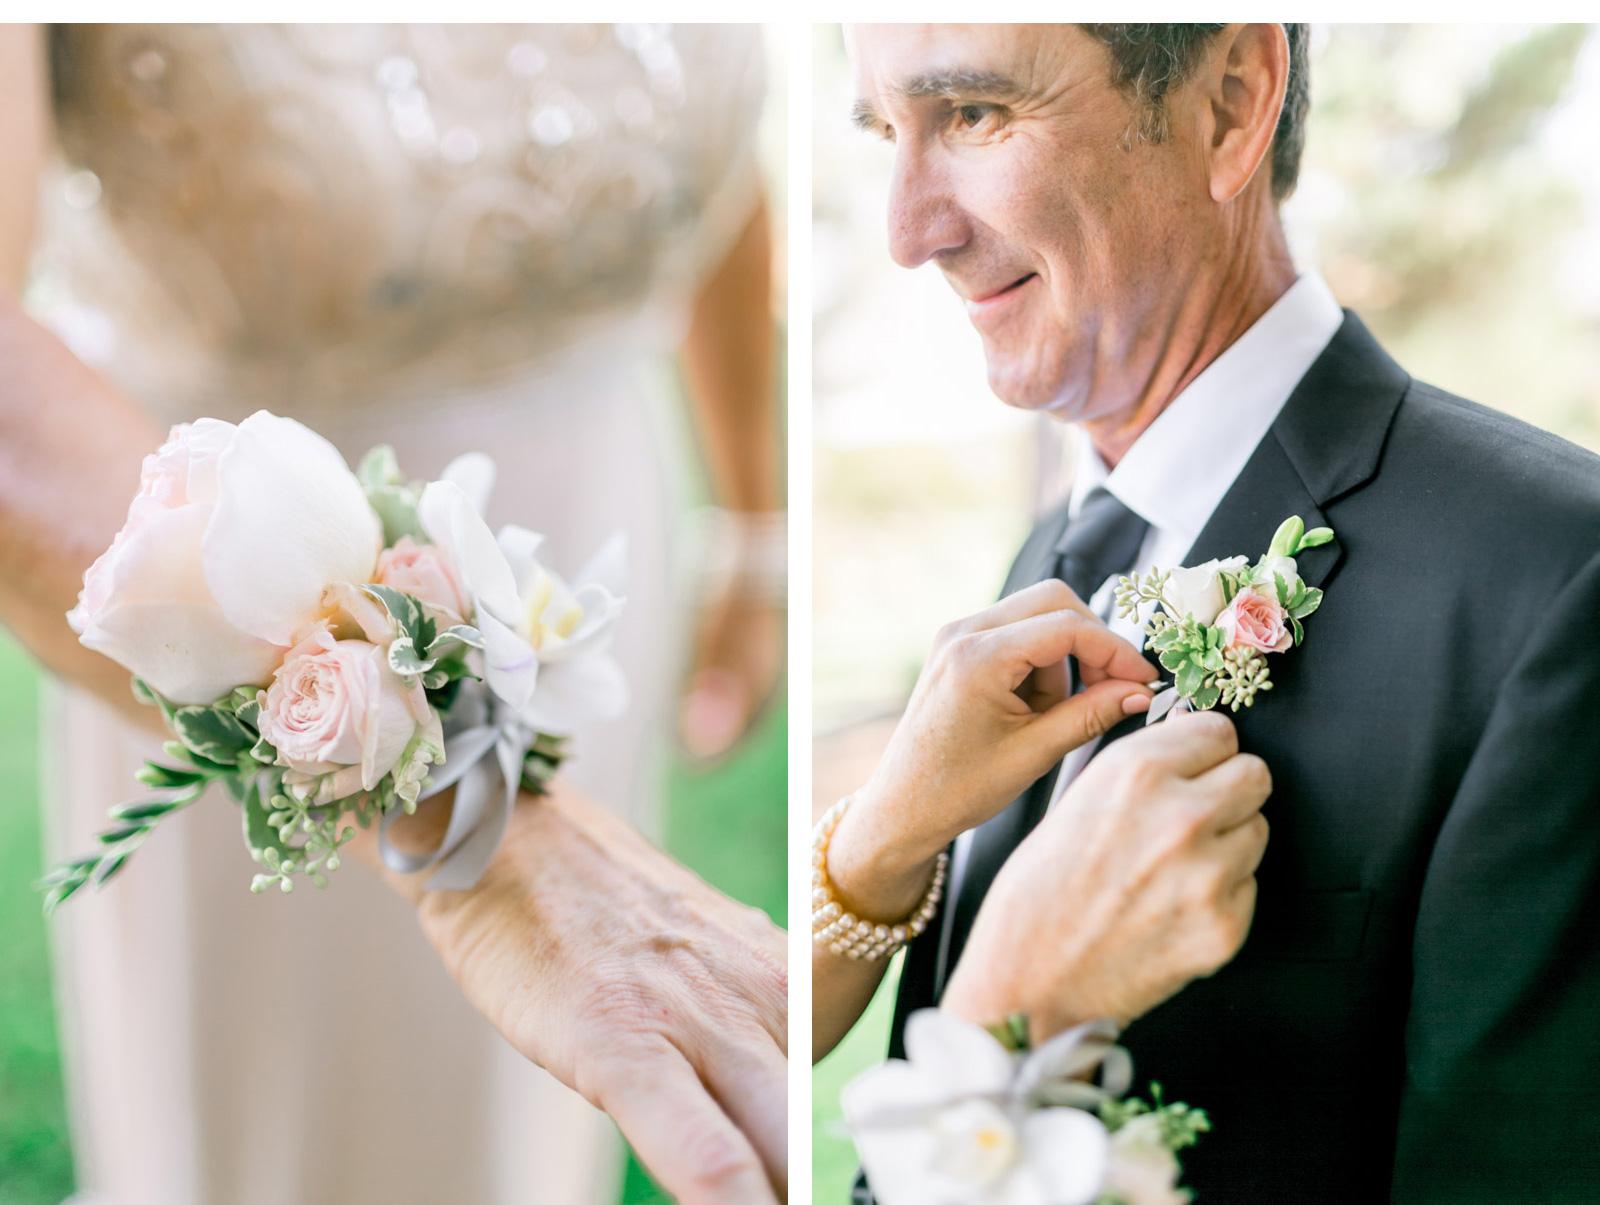 Nia-Sanchez-Southern-California-Wedding-Natalie-Schutt-Photography_01.jpg